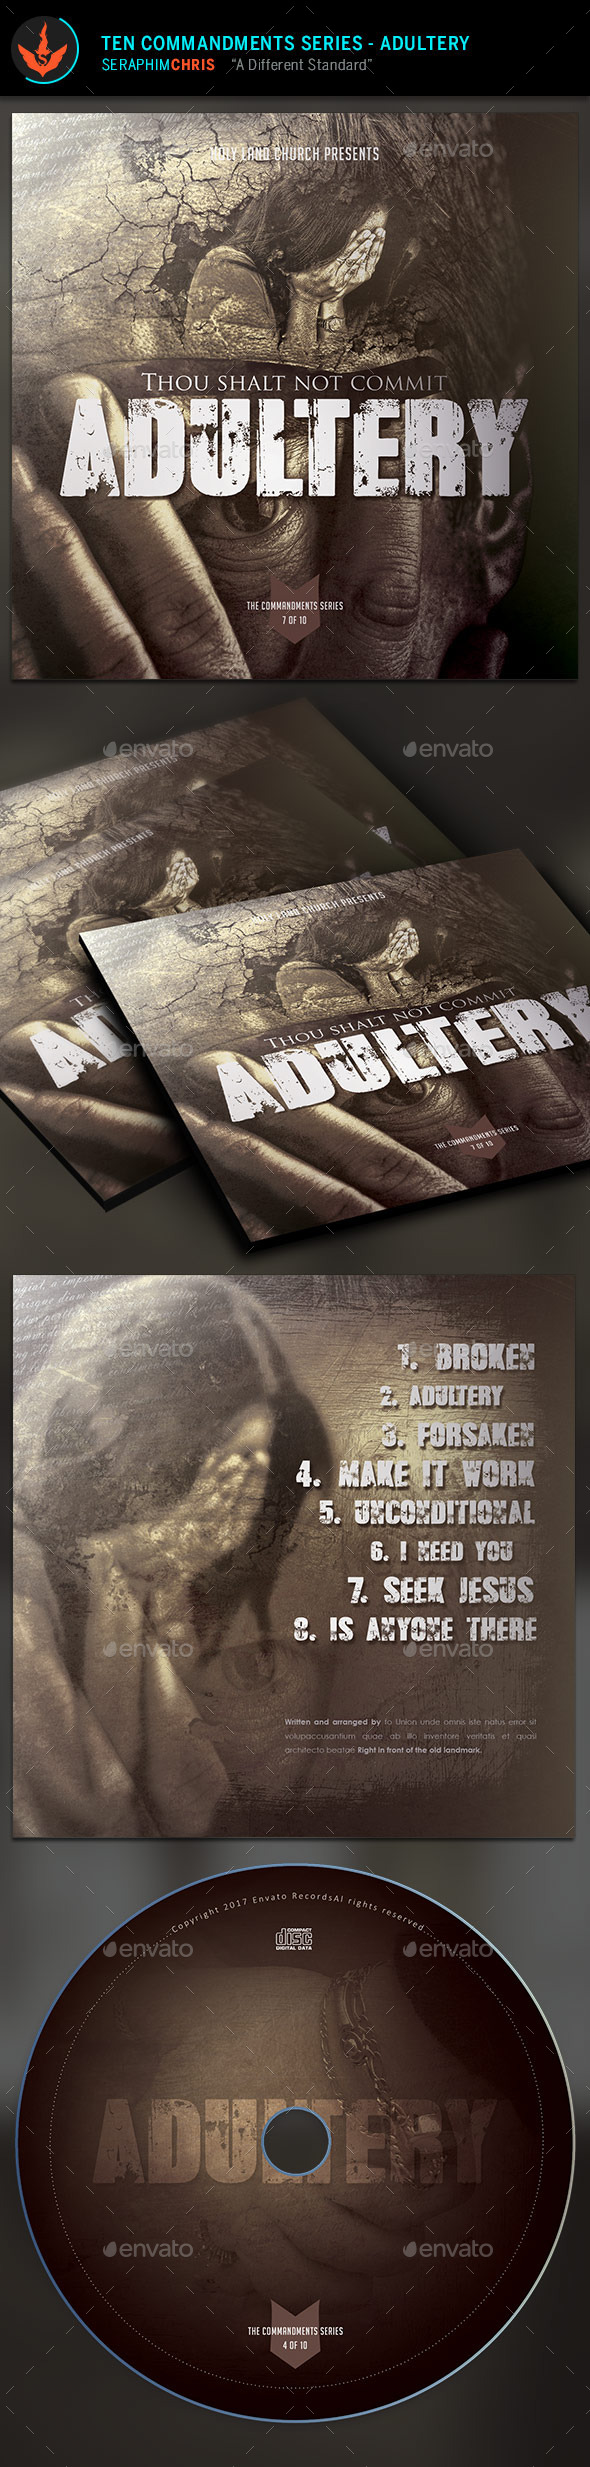 Adultery: CD Artwork Template - CD & DVD Artwork Print Templates